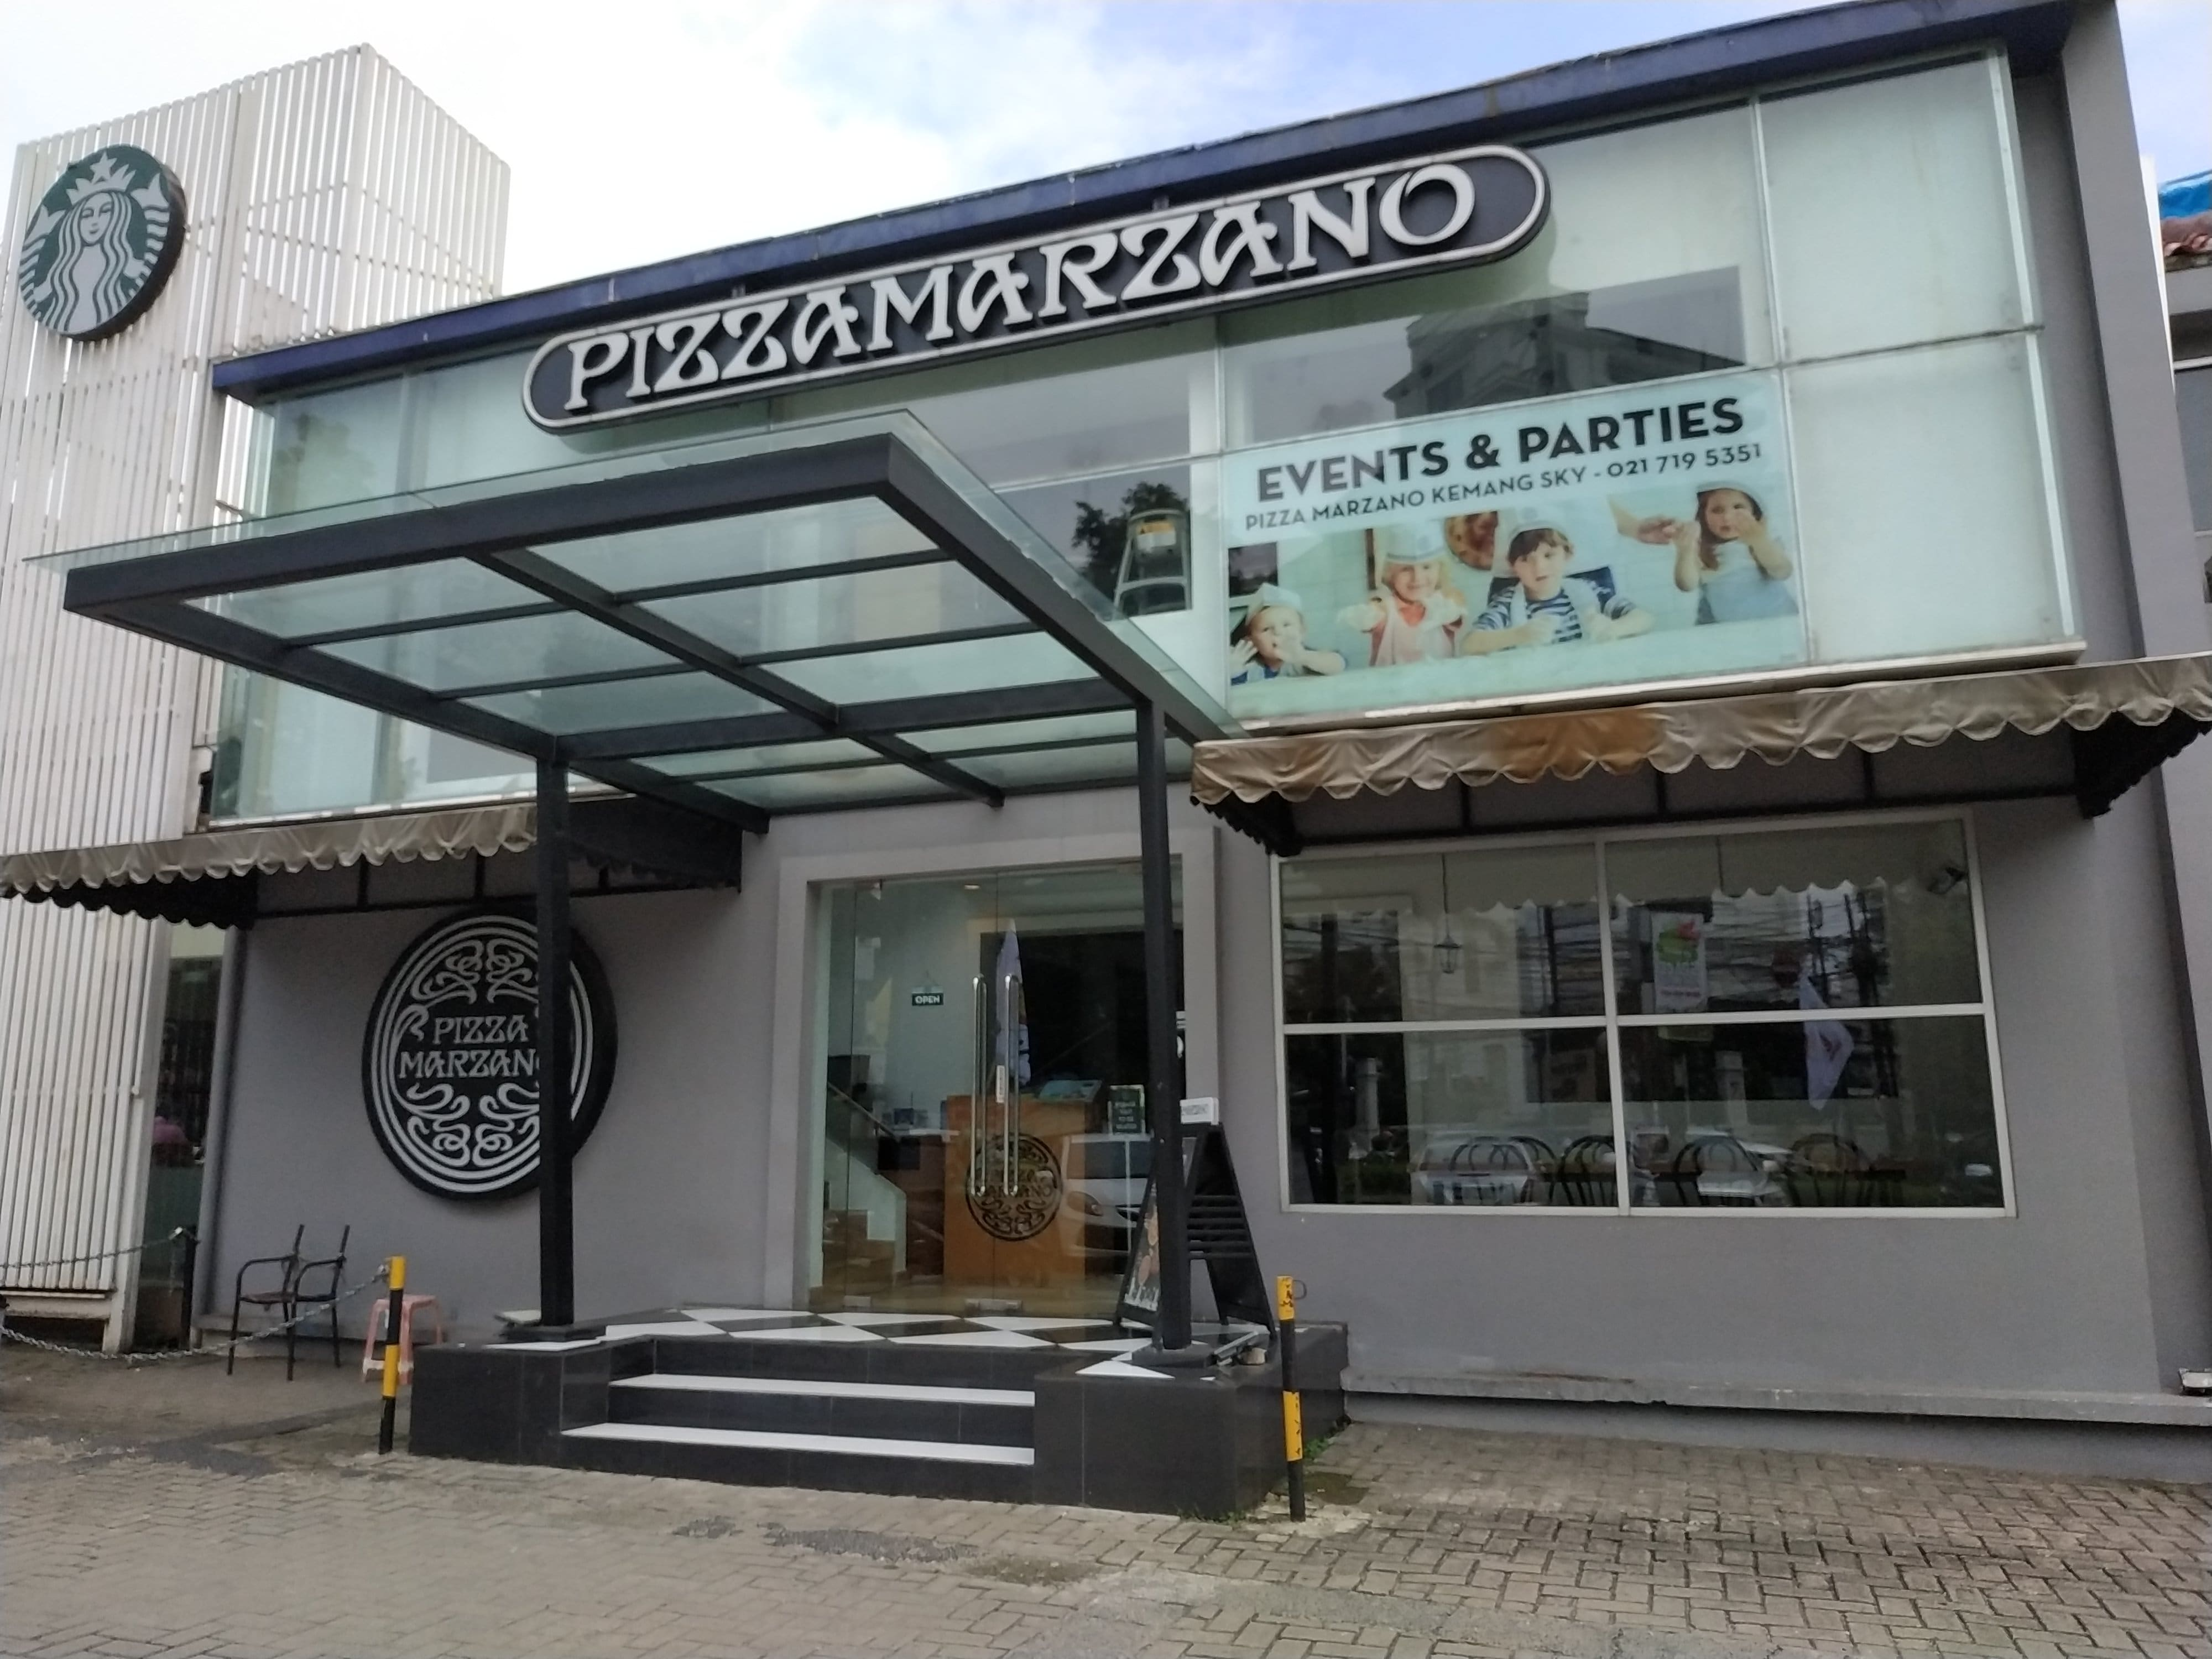 Pizza Marzano Menu Menu For Pizza Marzano Kemang Jakarta